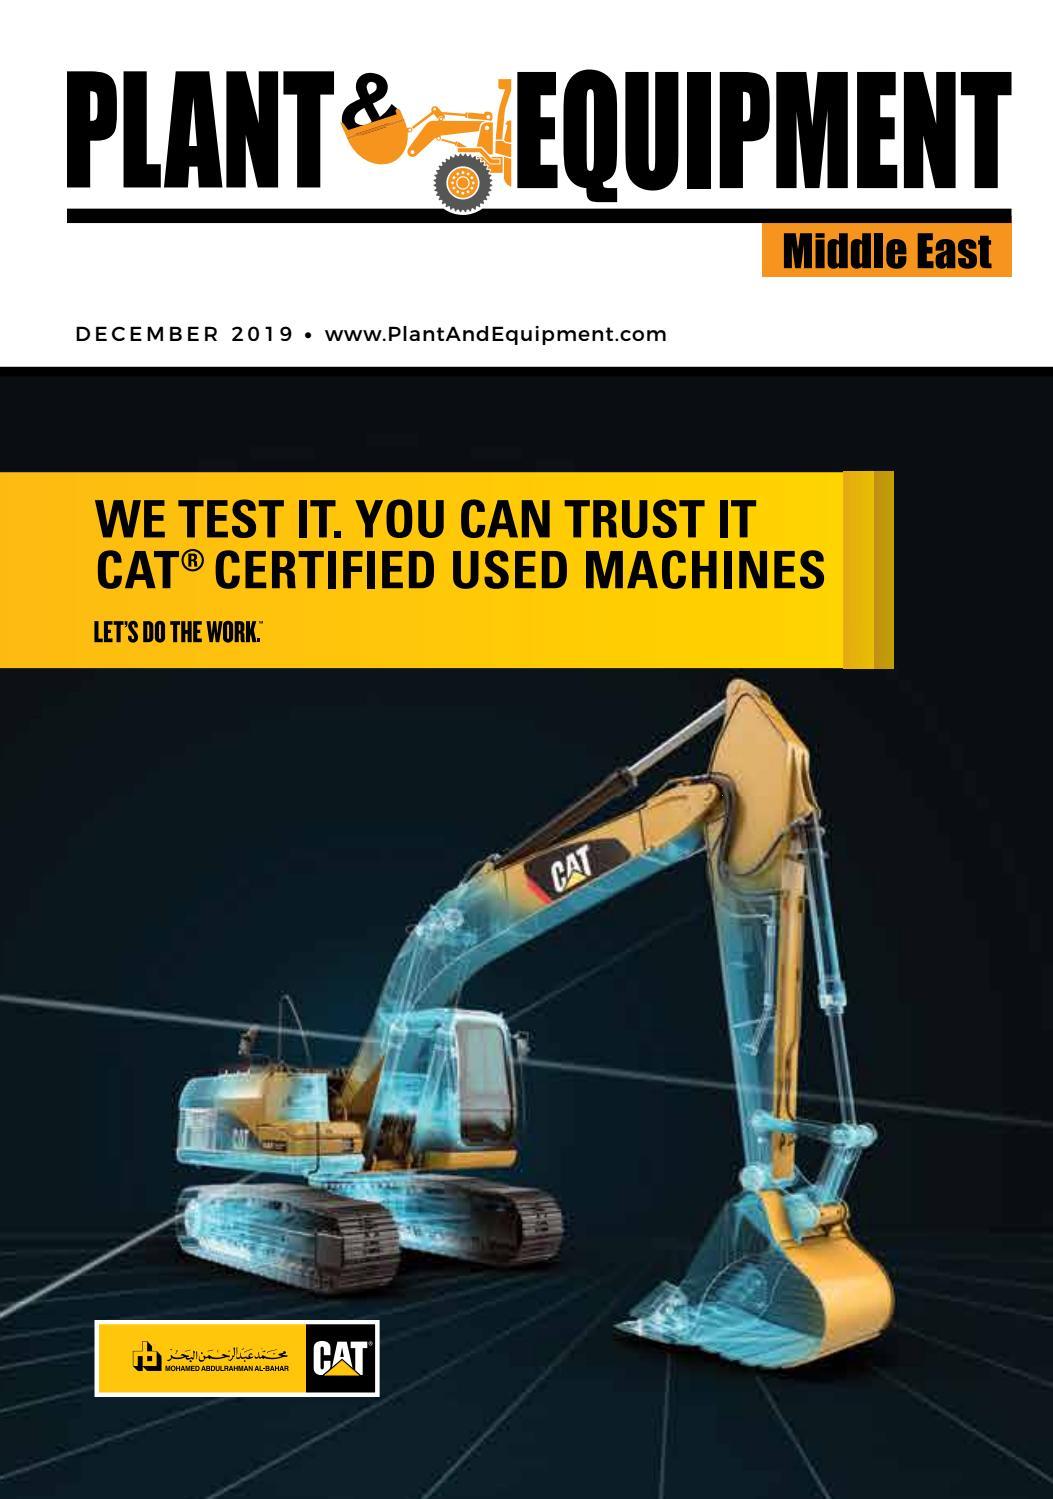 Excavator Construction machine test Coupling kit for Caterpillar Komatsu 5 Pack